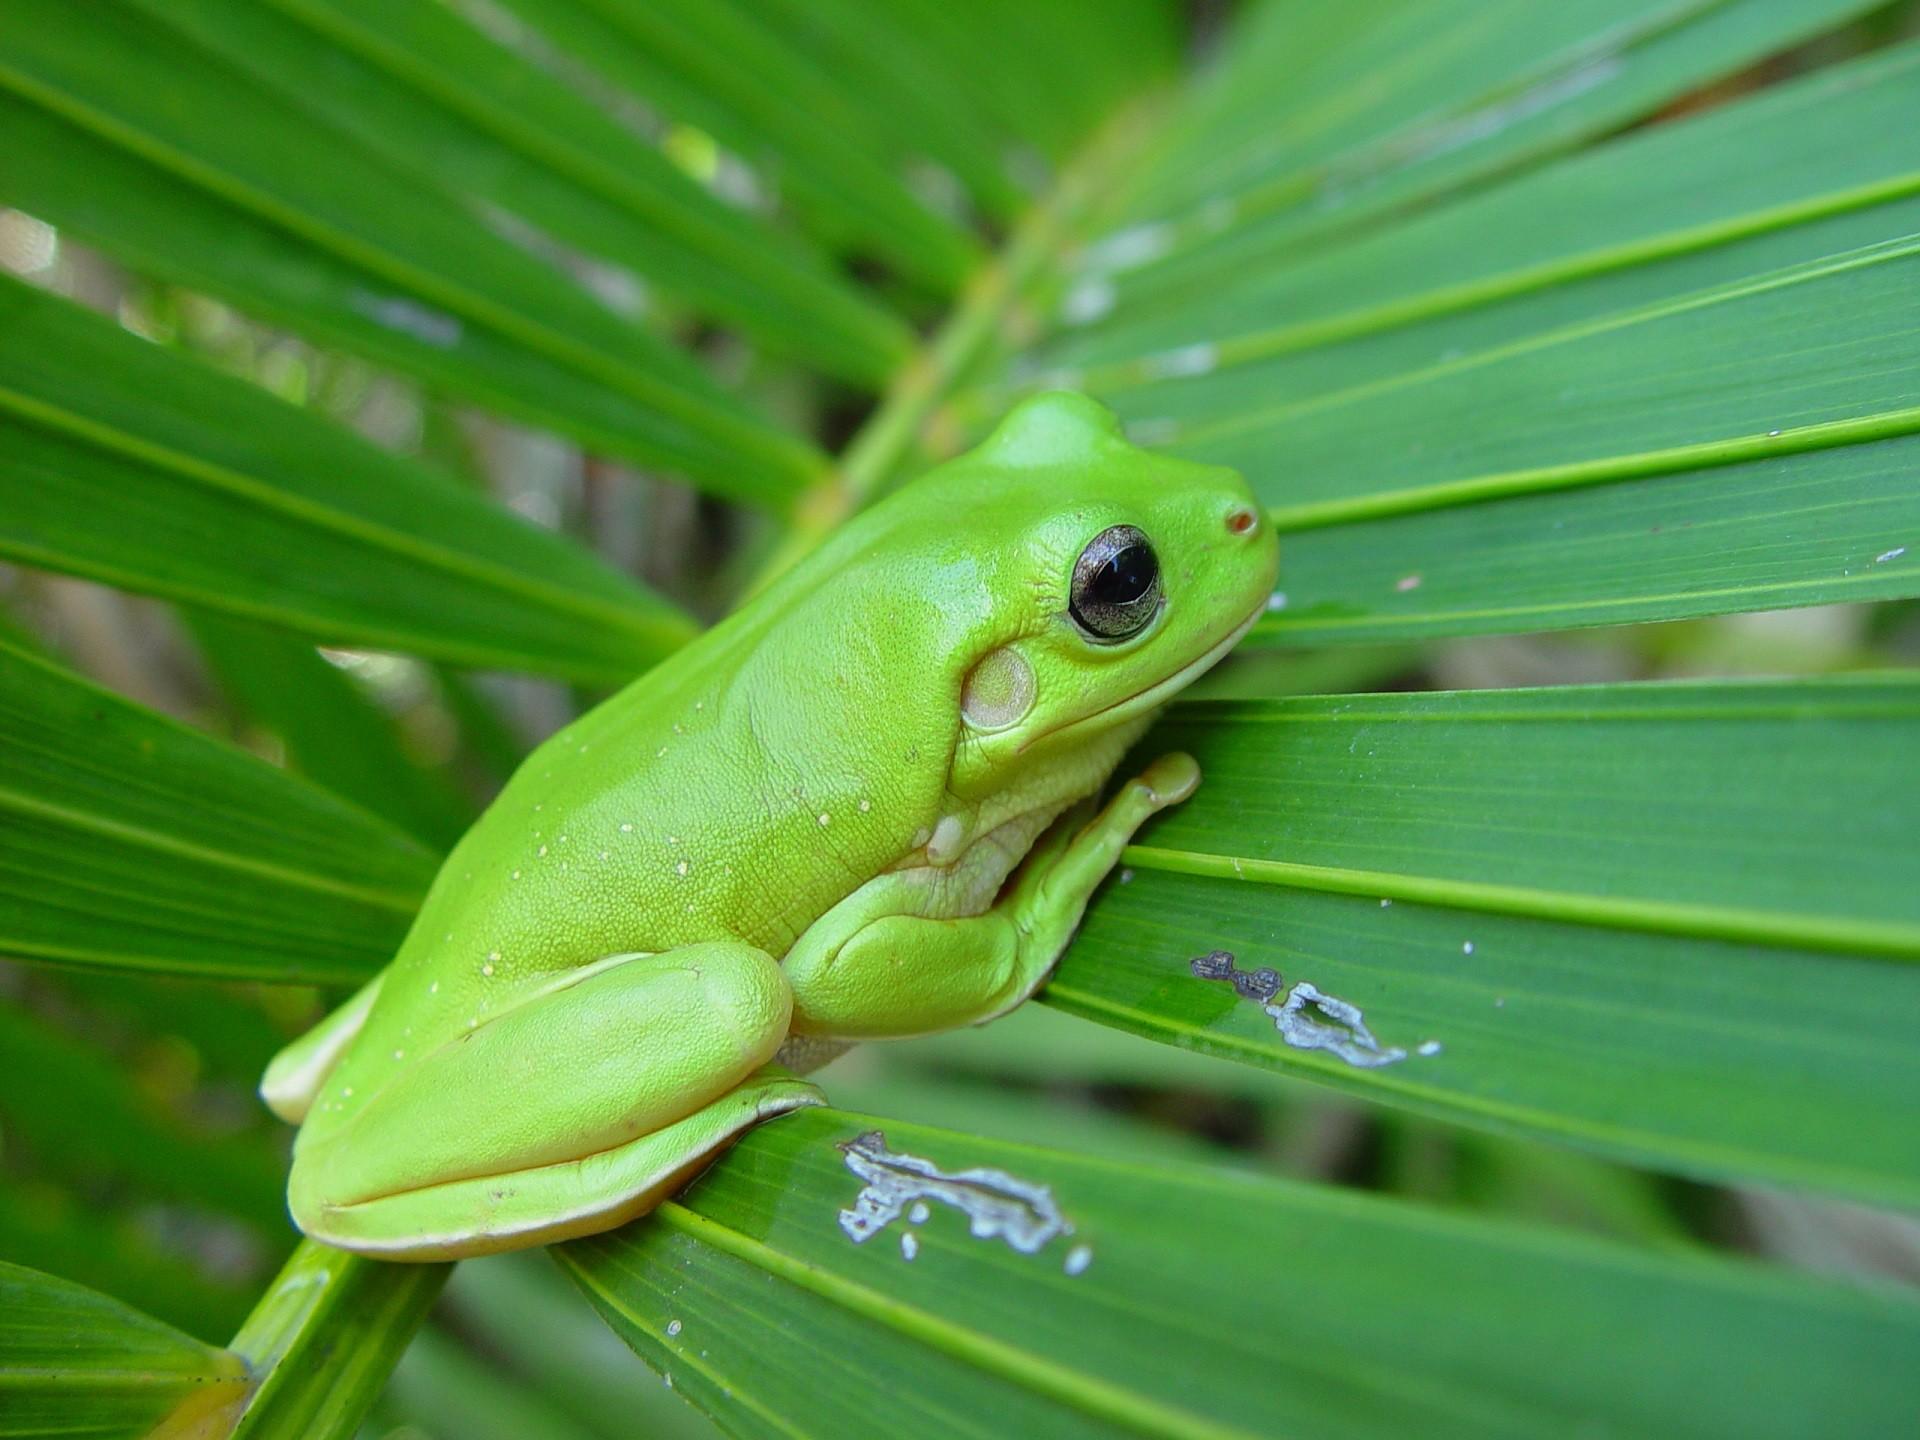 Res: 1920x1440, Green tree frog wallpaper - photo#12